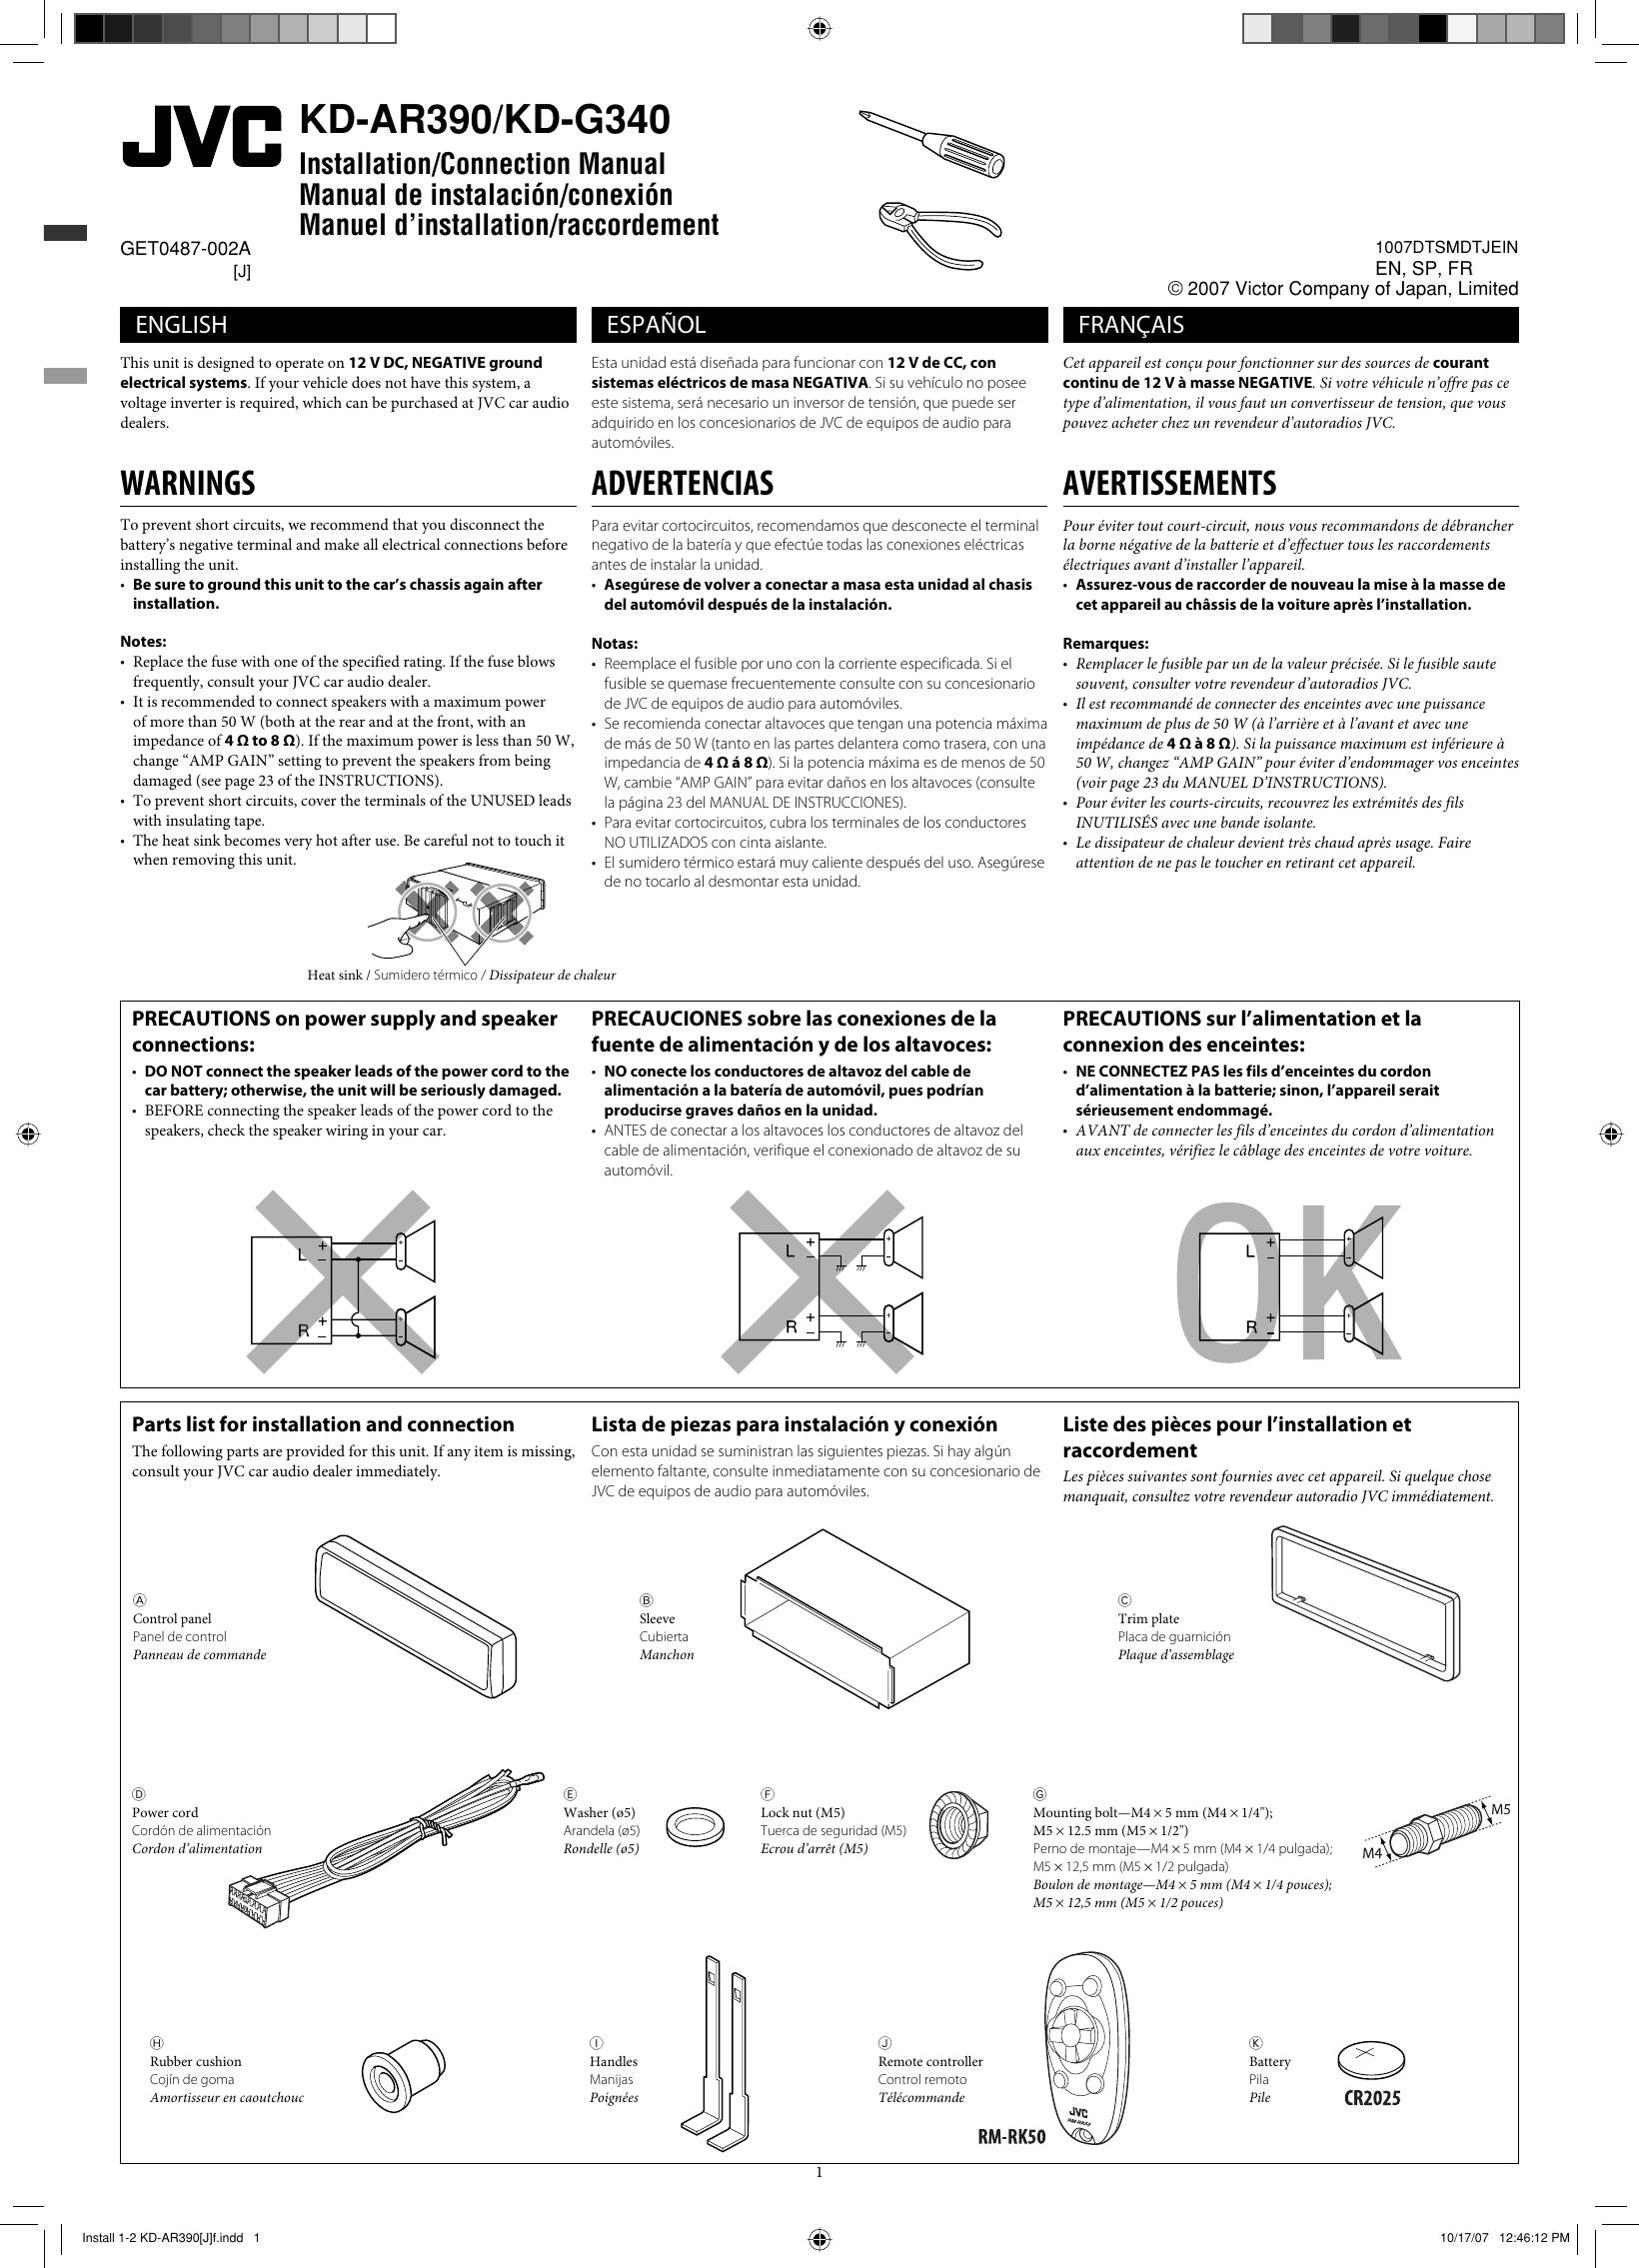 Jvc Kd G340 Installation Manual Install 1 2 AR390[J]f Kd G Jvc Radio Wiring Diagram on